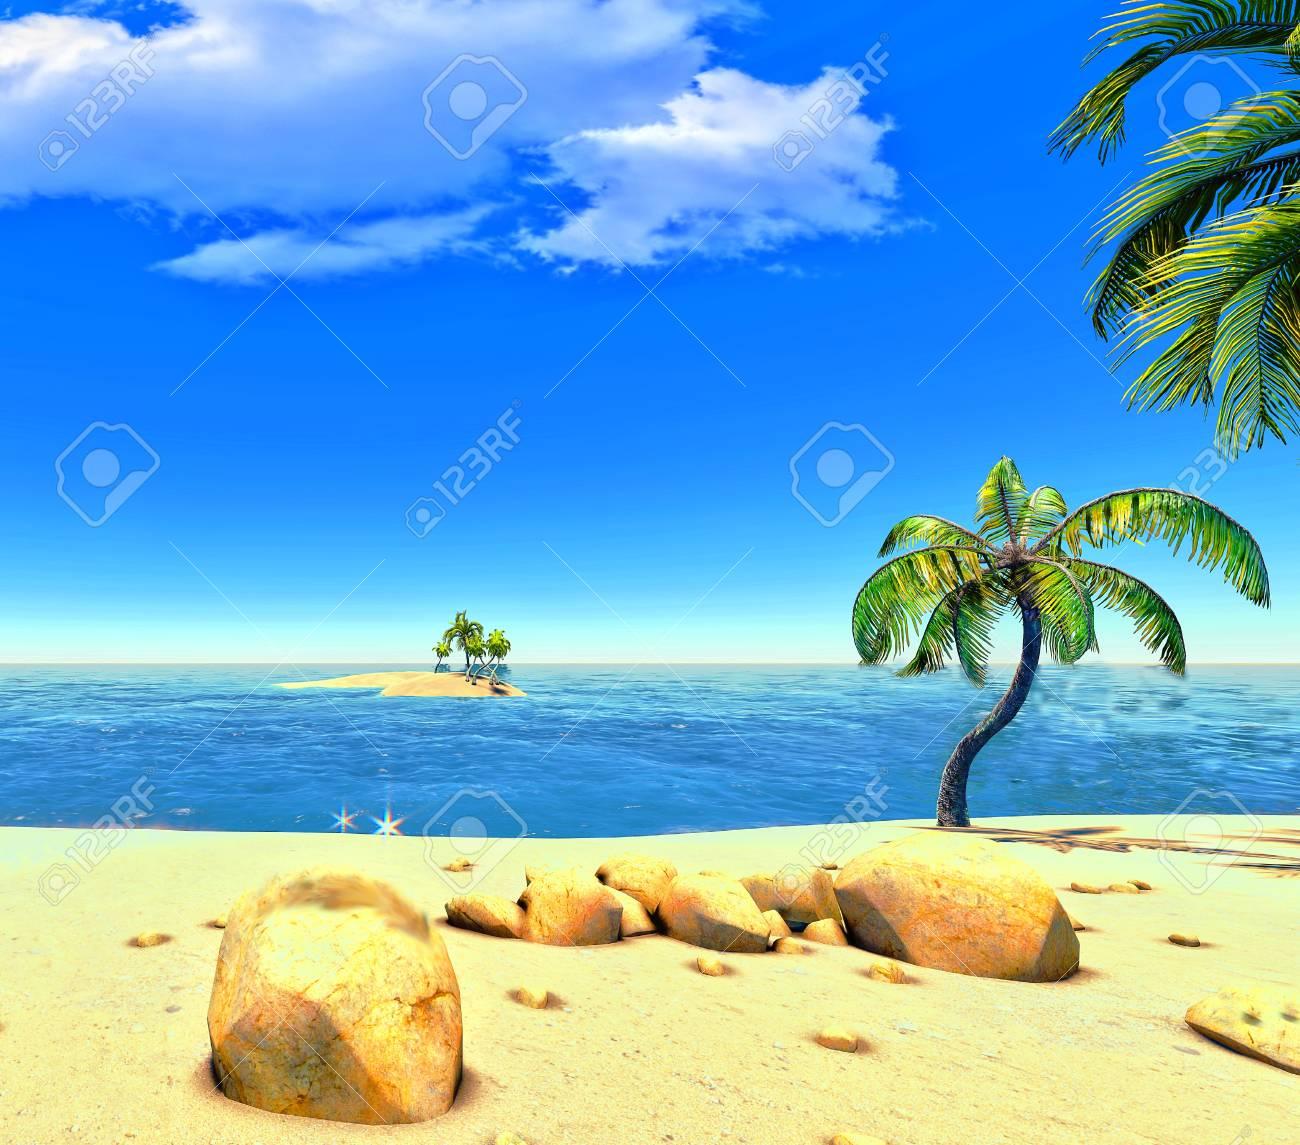 Beach, island and palms Stock Photo - 14324712